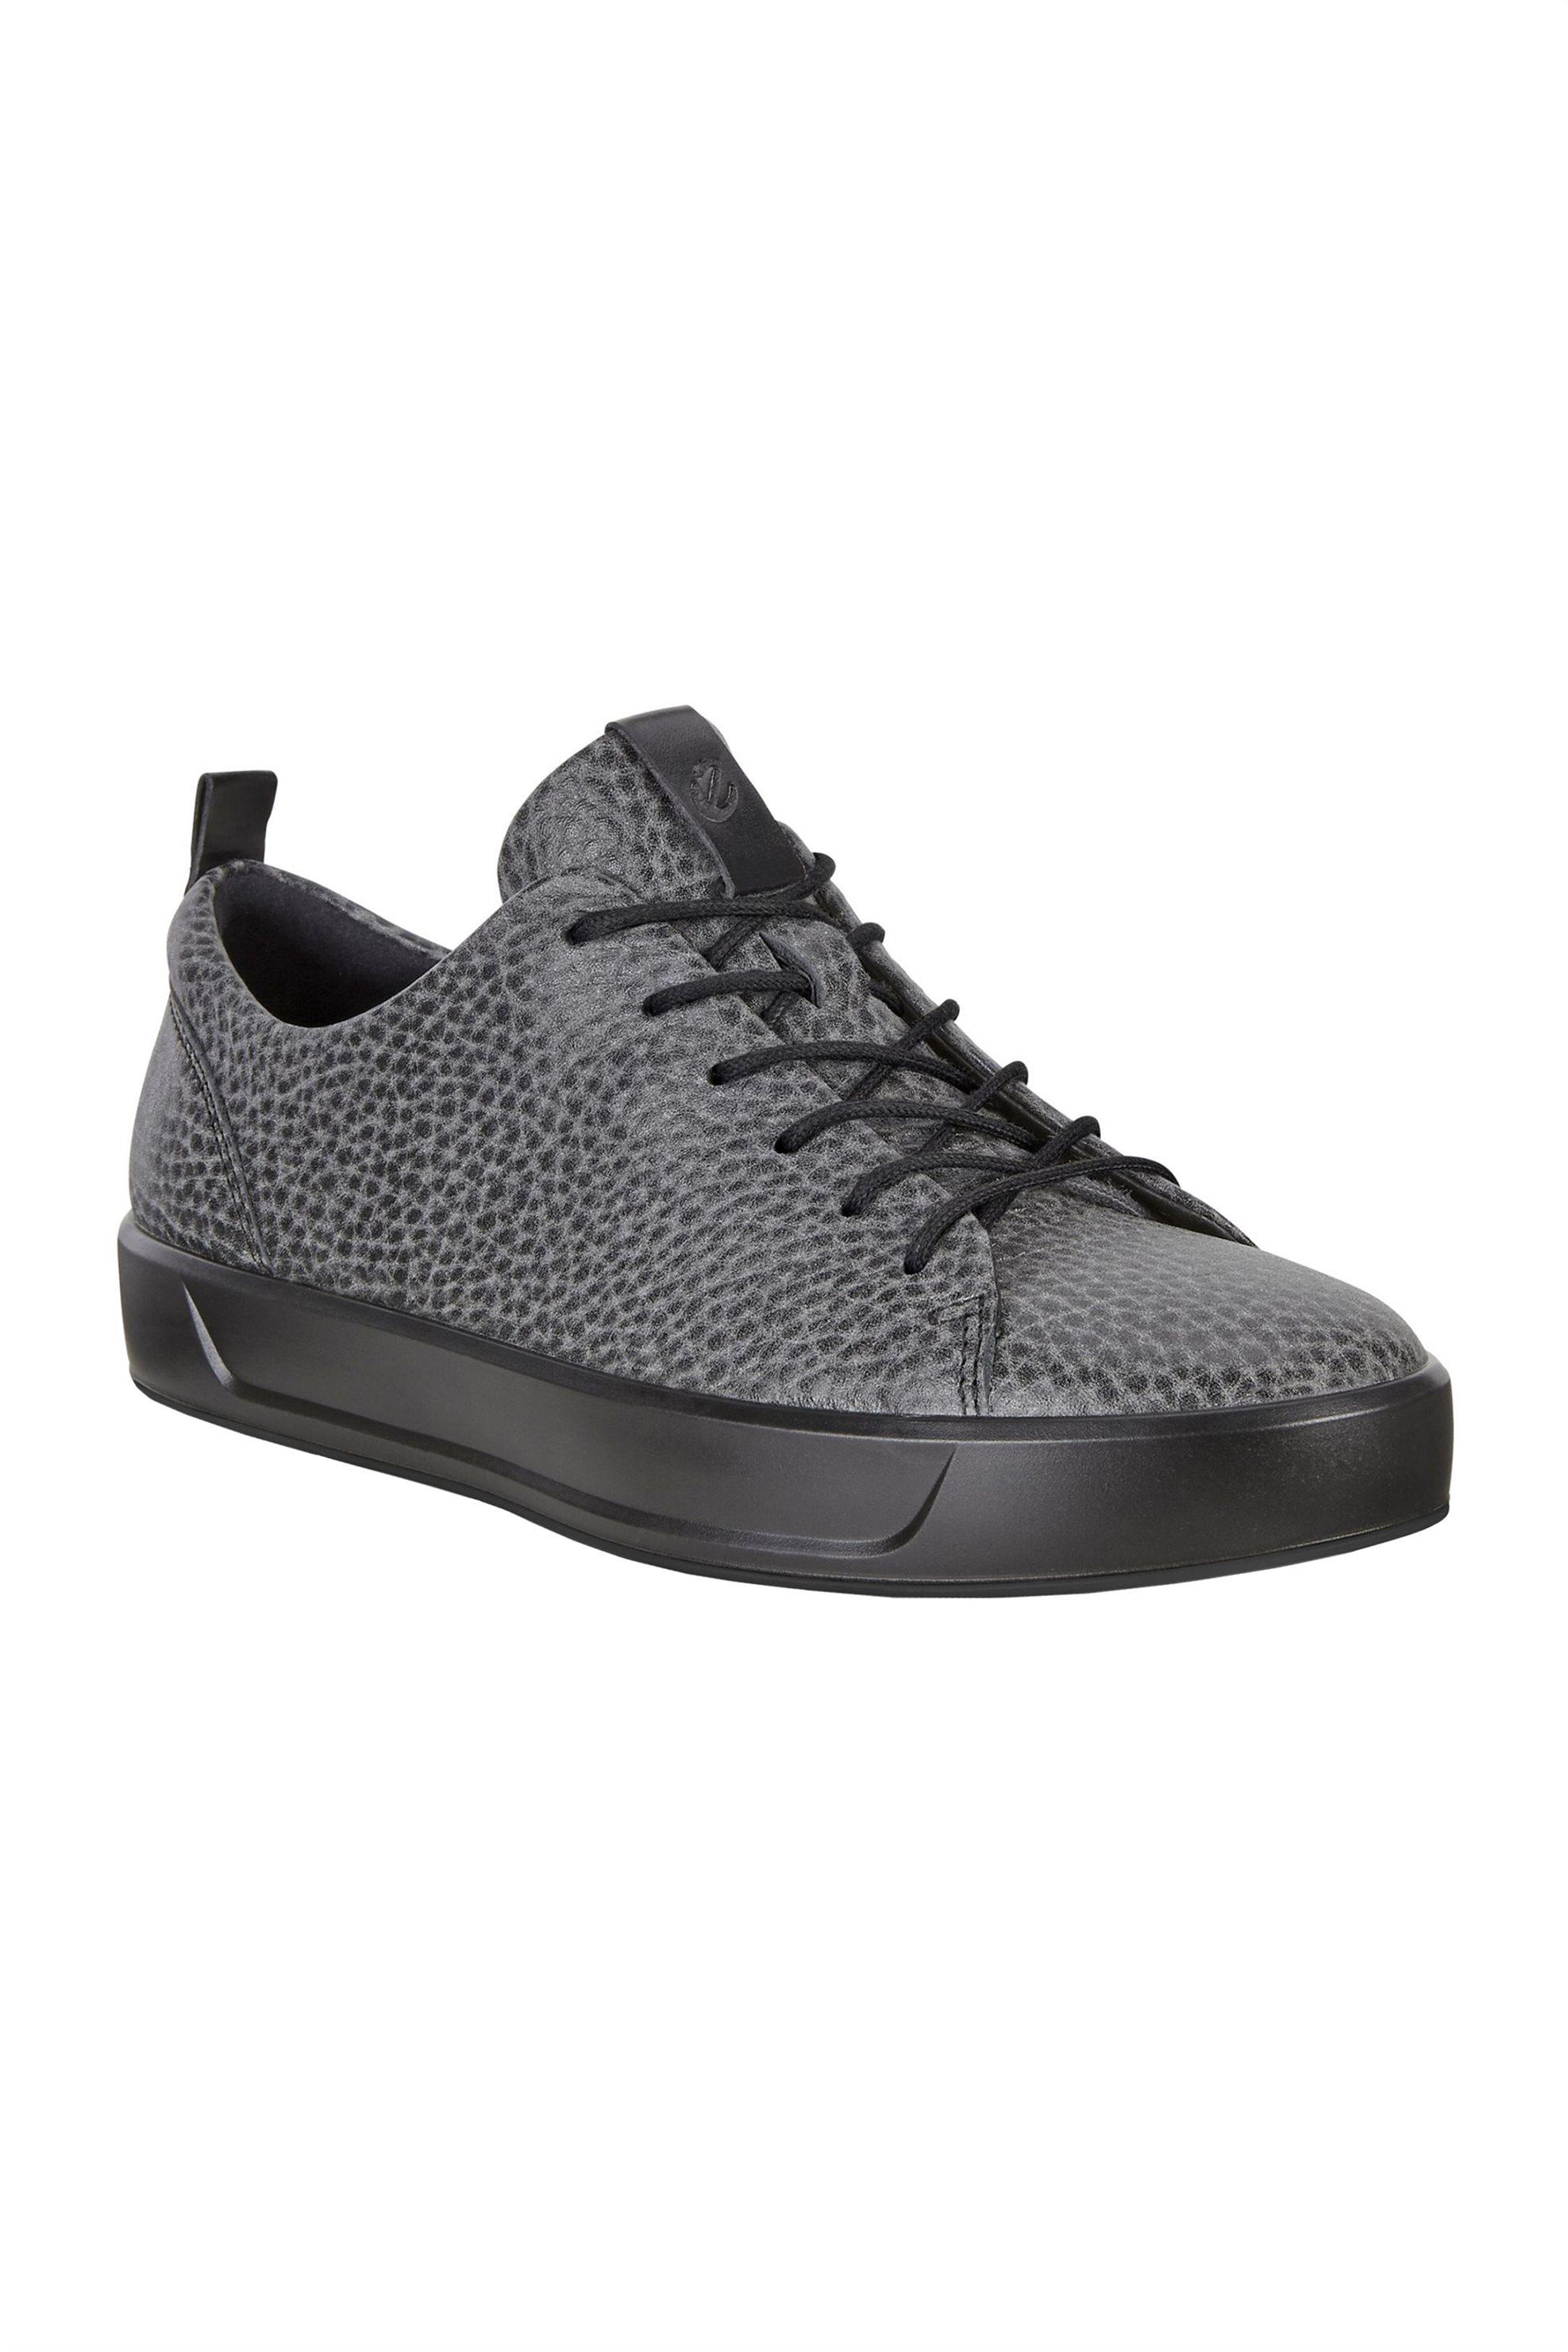 -30% Notos ECCO γυναικεία παπούτσια με κορδόνια Soft 8 – 440793 – Γκρι b96a15b1687